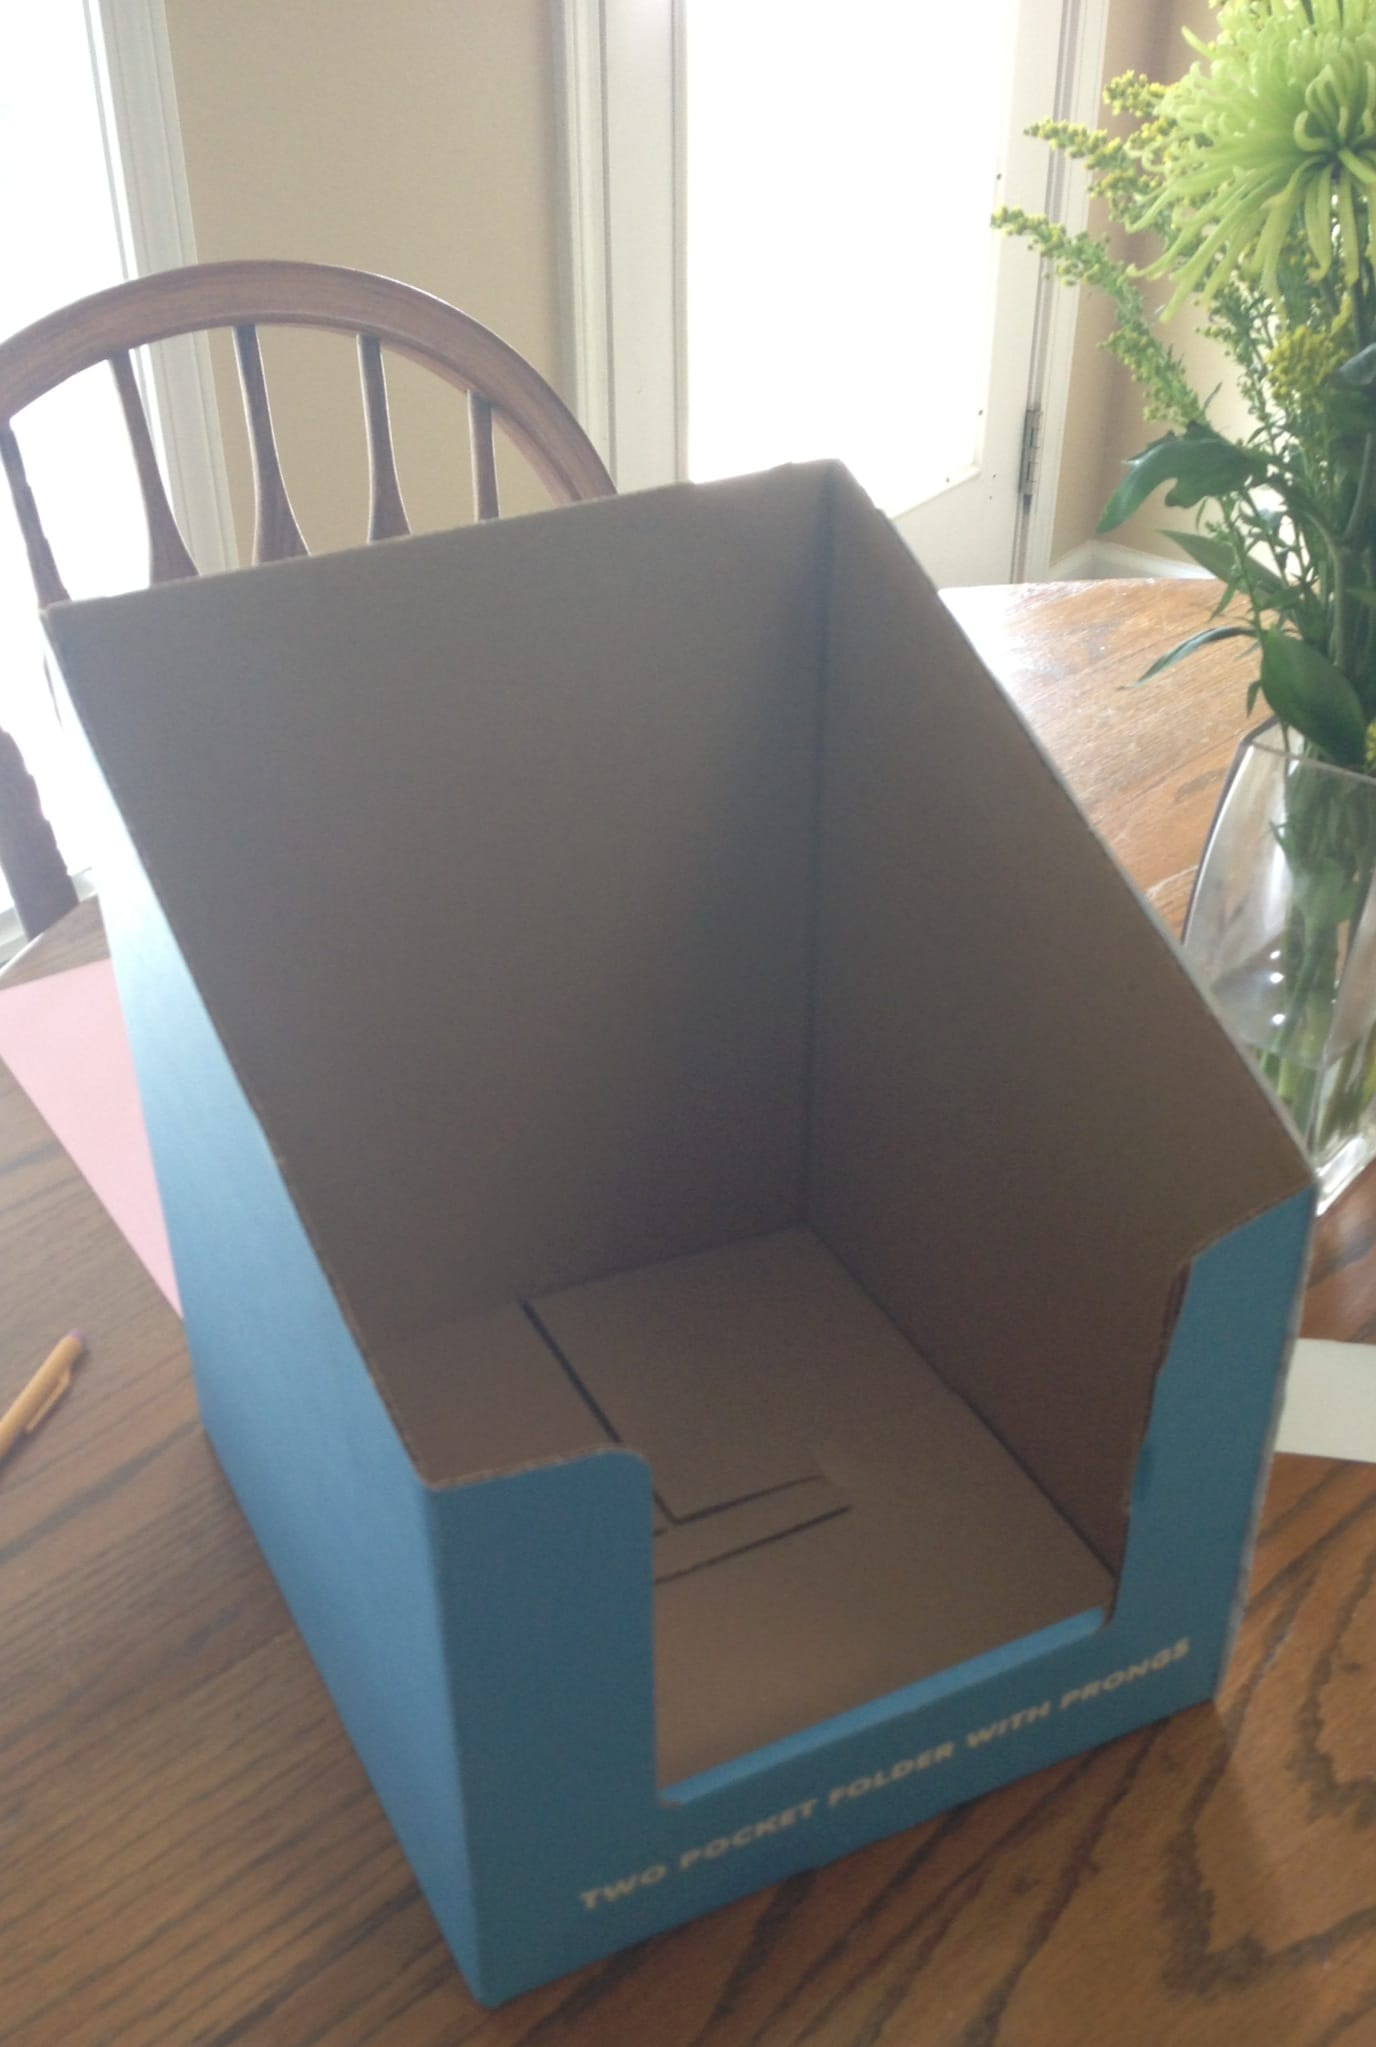 Simple DIY File & Paper Organizer for Teachers